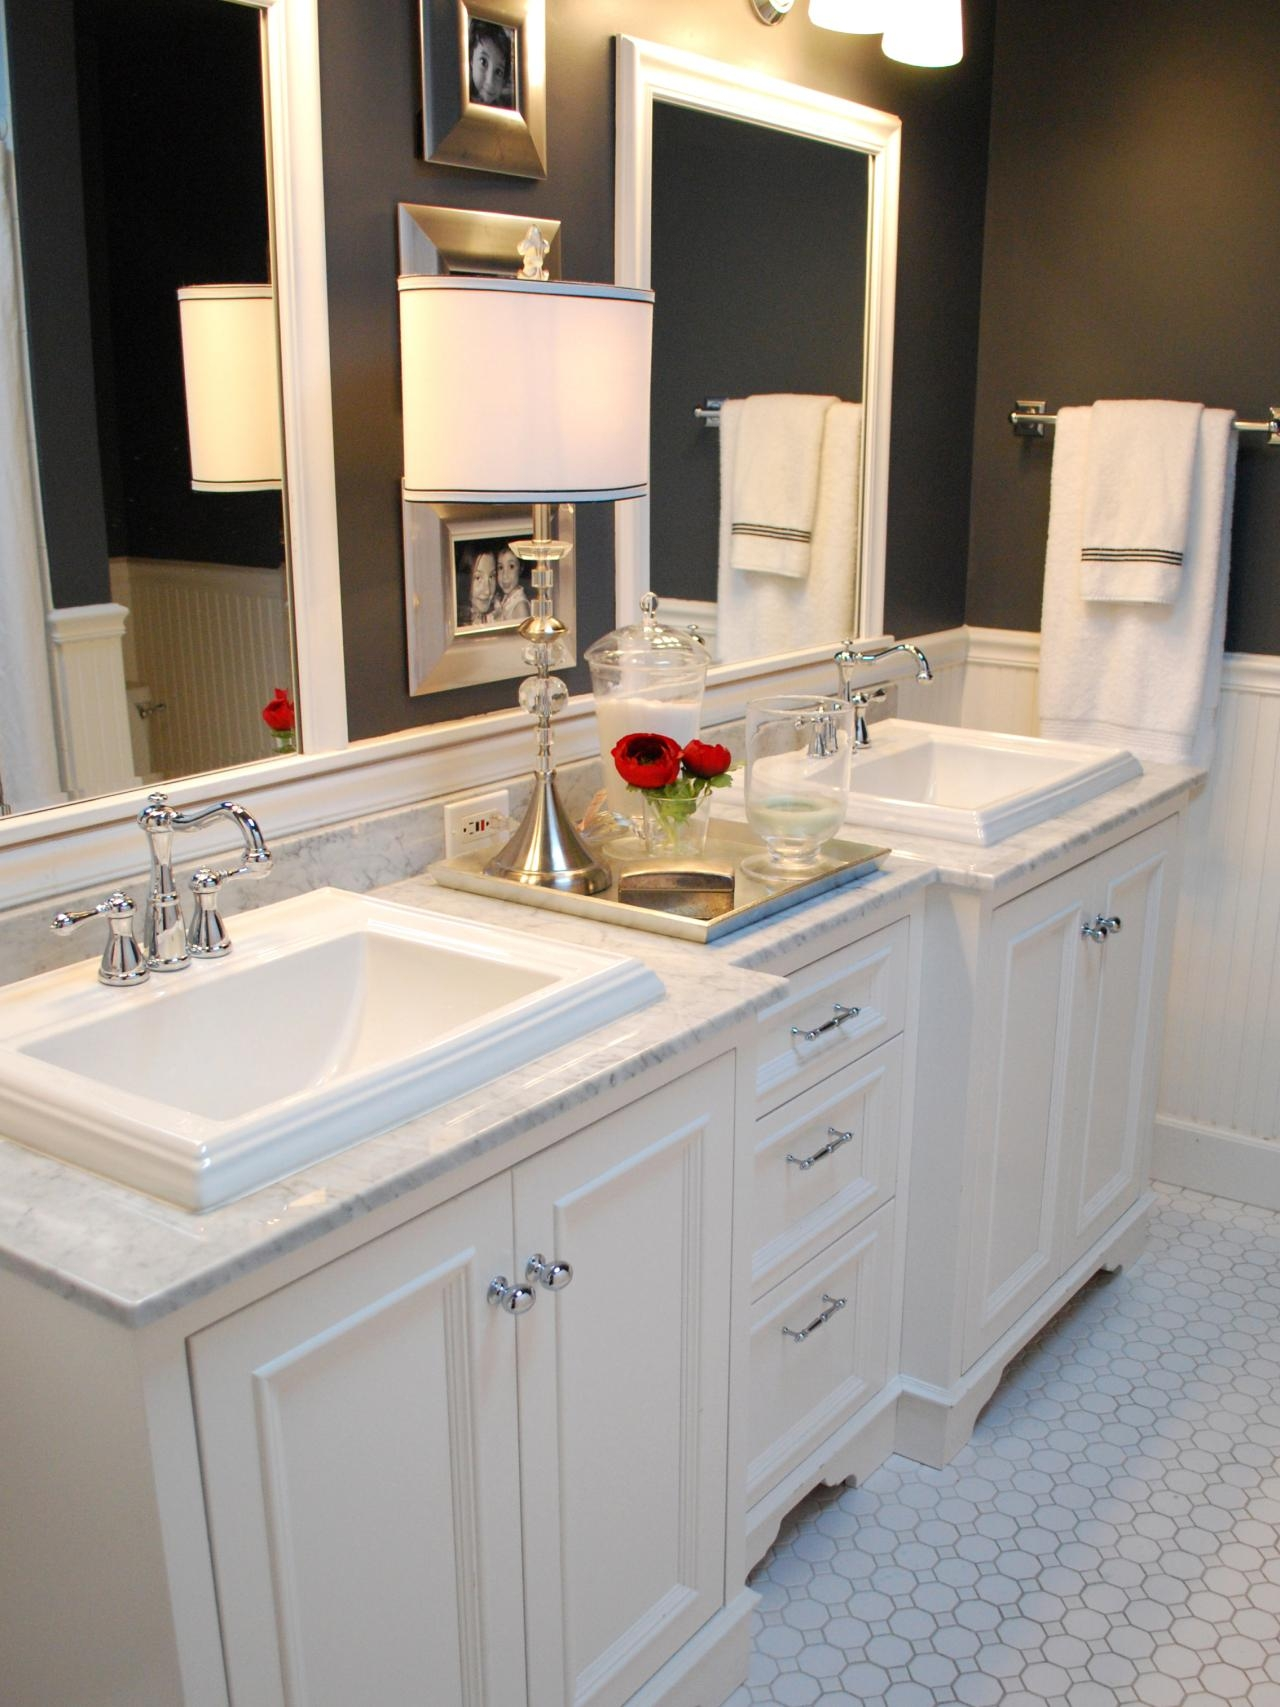 Bathroom Safe Chandeliers Uk Bathroom Design 2017 2018 With Bathroom Safe Chandeliers (Image 12 of 24)